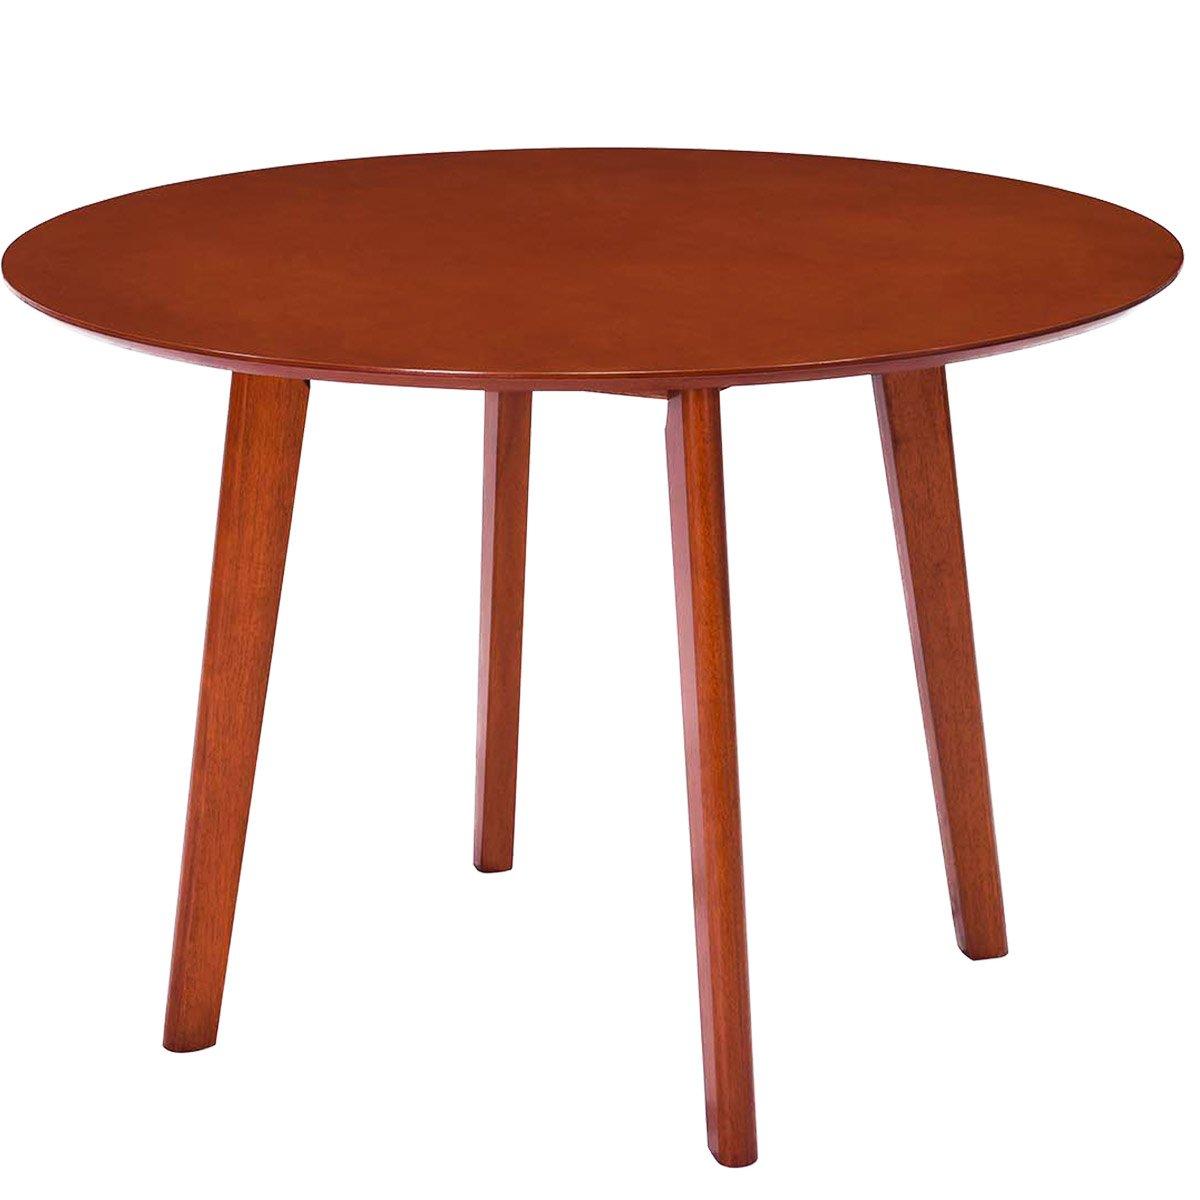 Harper&Bright Designs Round Wood Dining Table 41.7-inch Diameter (Oak)